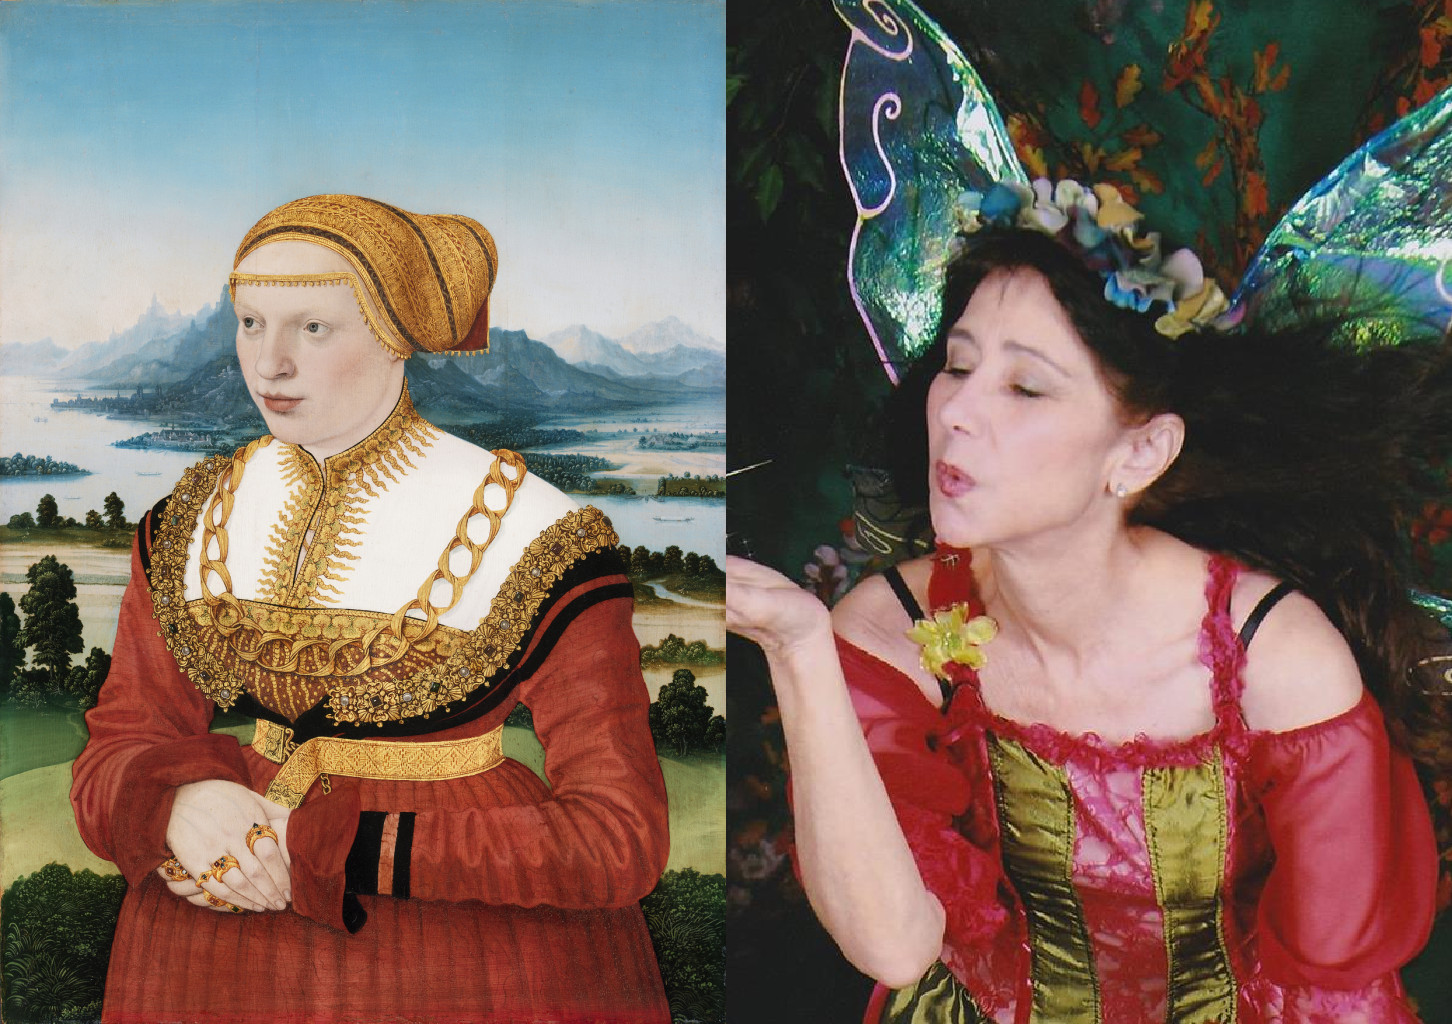 Portrait of Katherina Knoblauch, Conrad Faber von Creuznach (active c. 1500 – 1652/53) vanGo'd by barbara